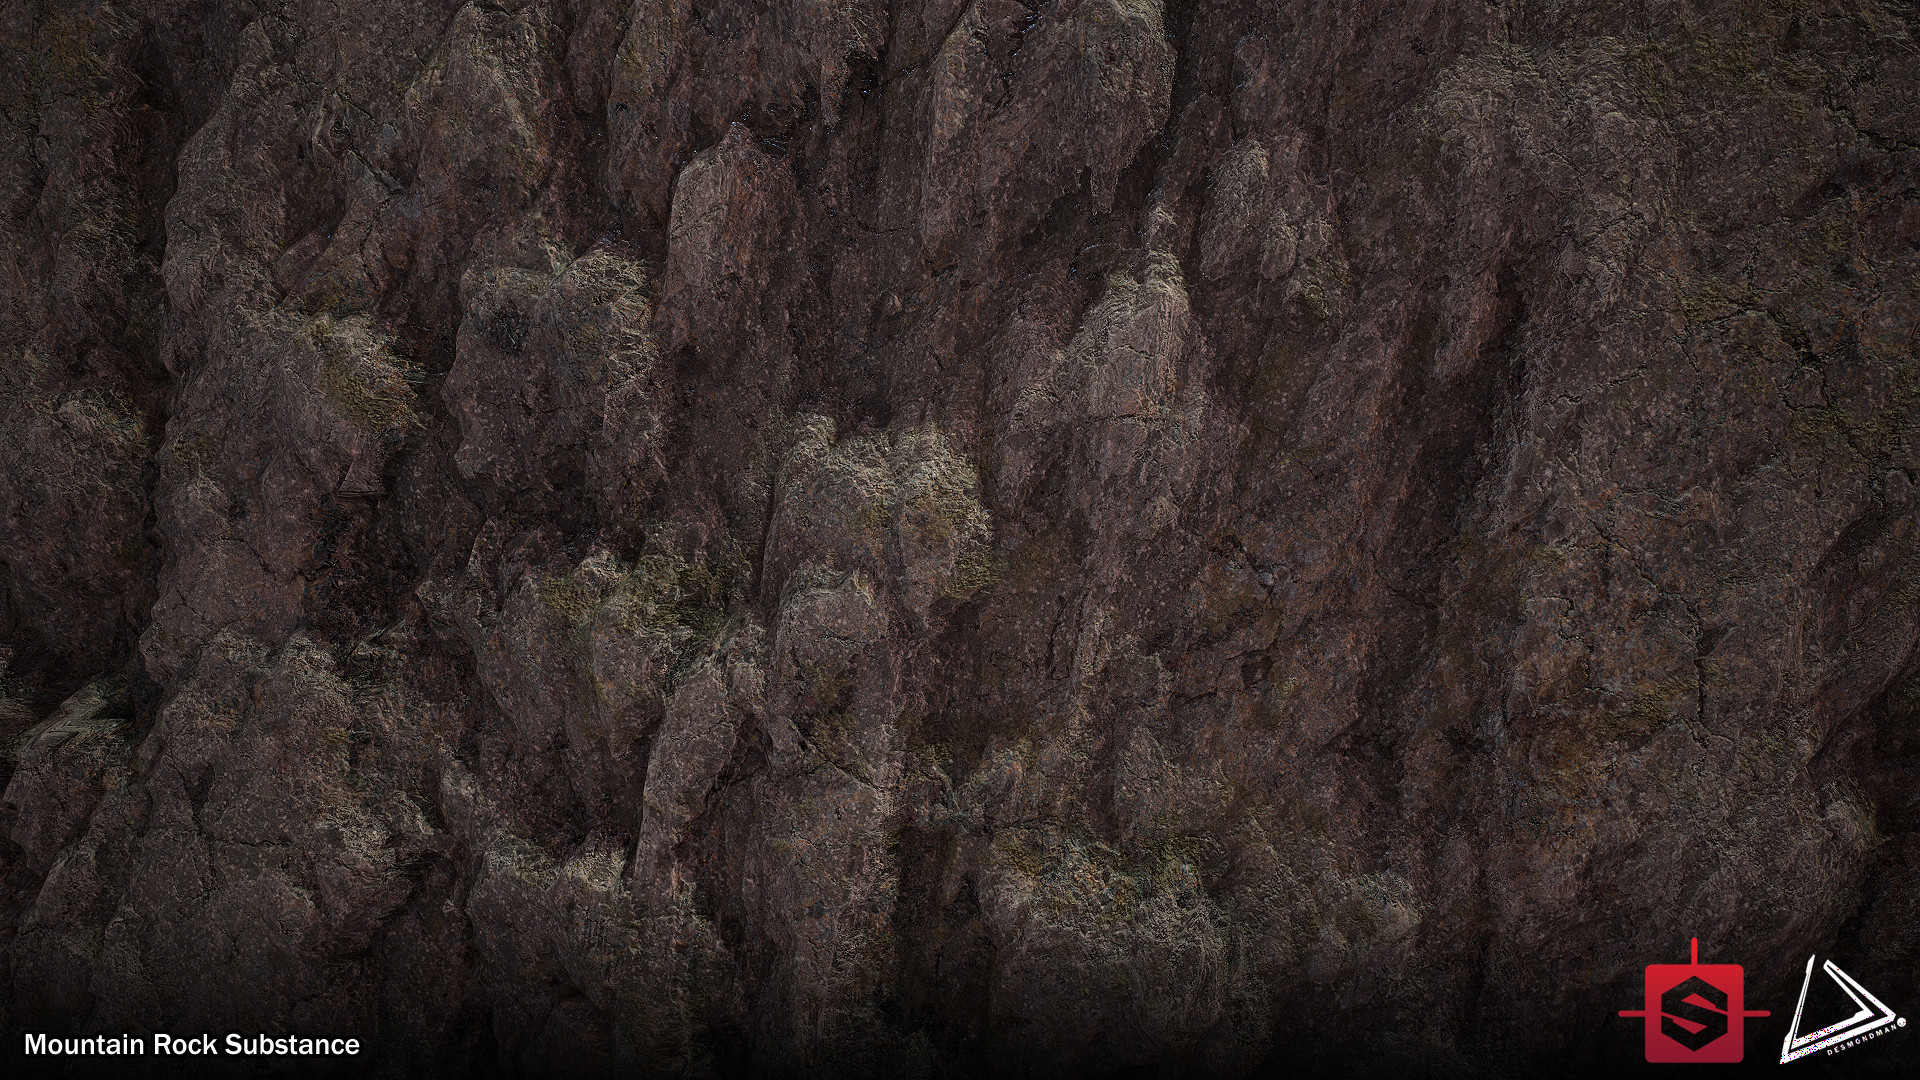 Desmond man sbwc mountainrock01 showcase03